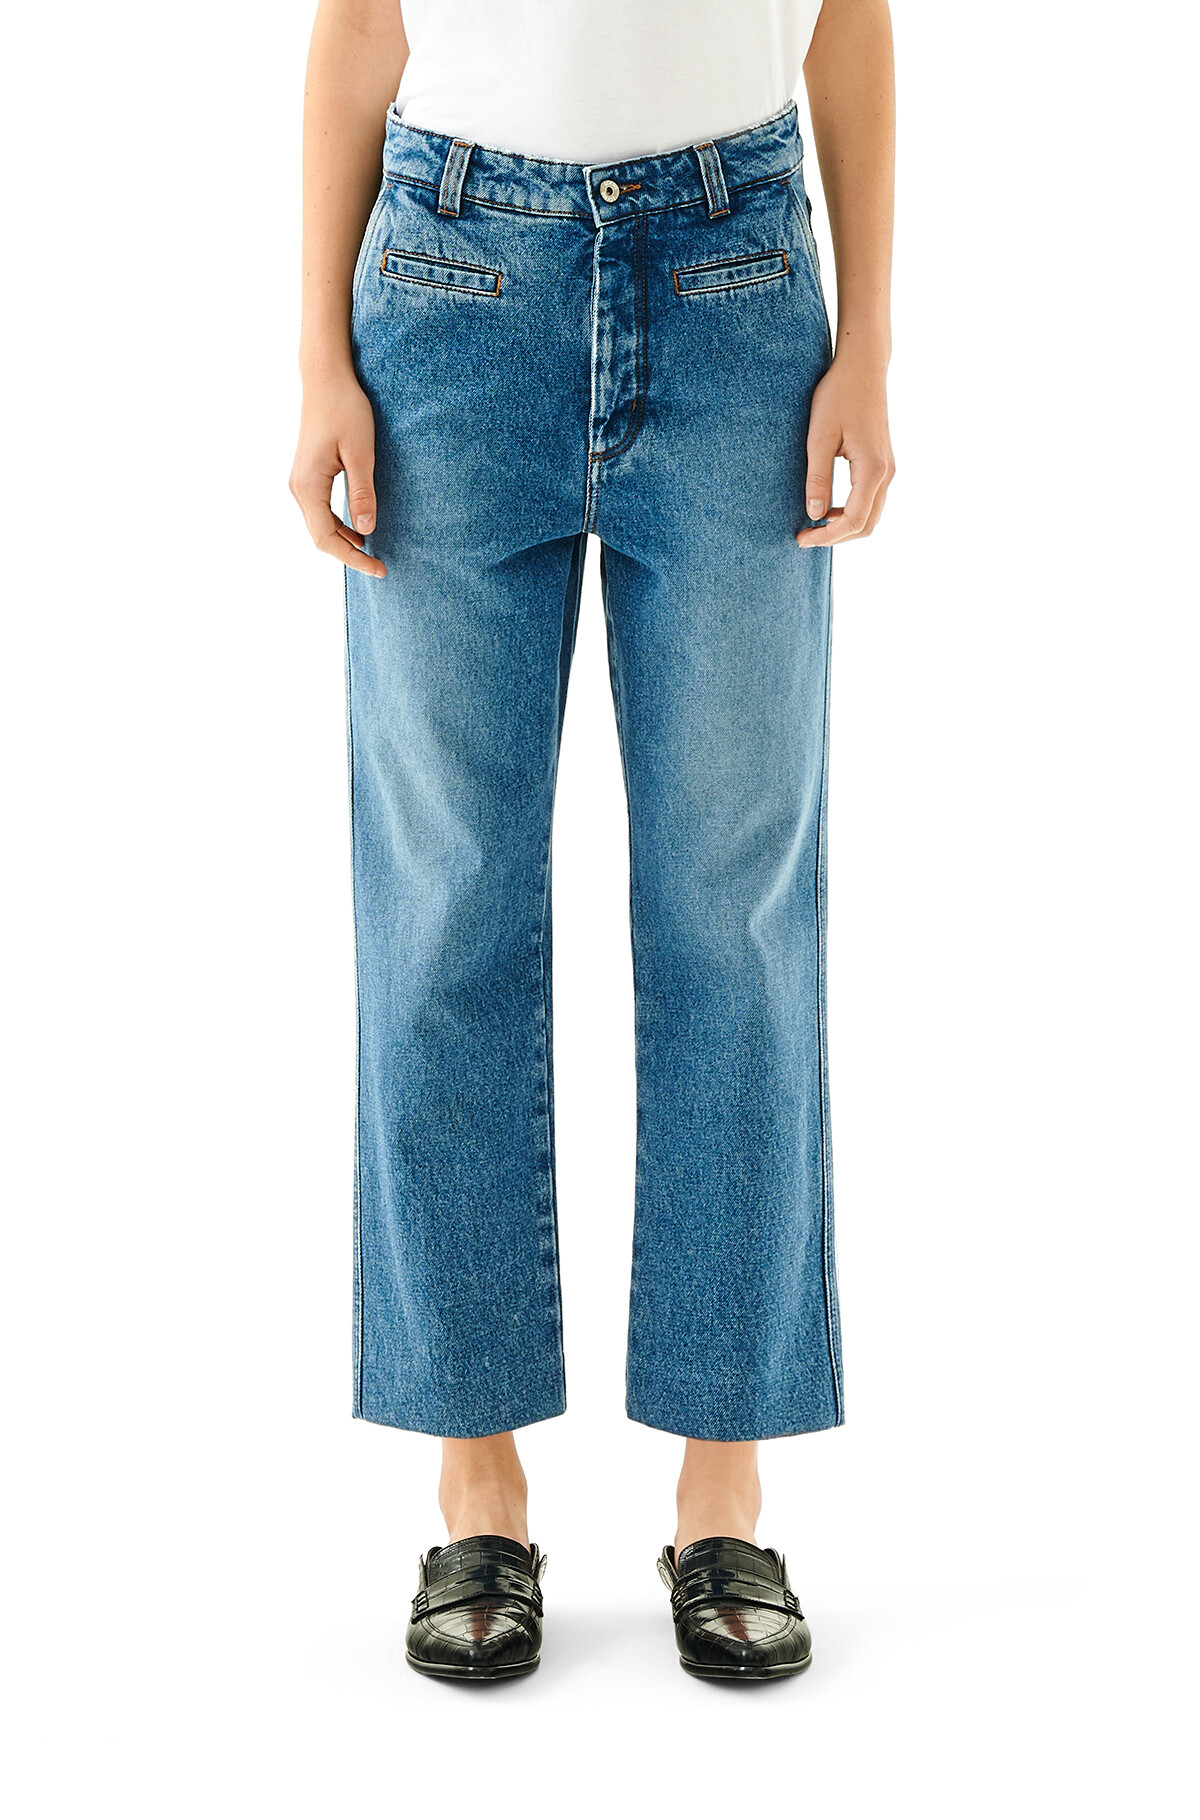 LOEWE Fisherman Jeans Washed Denim front